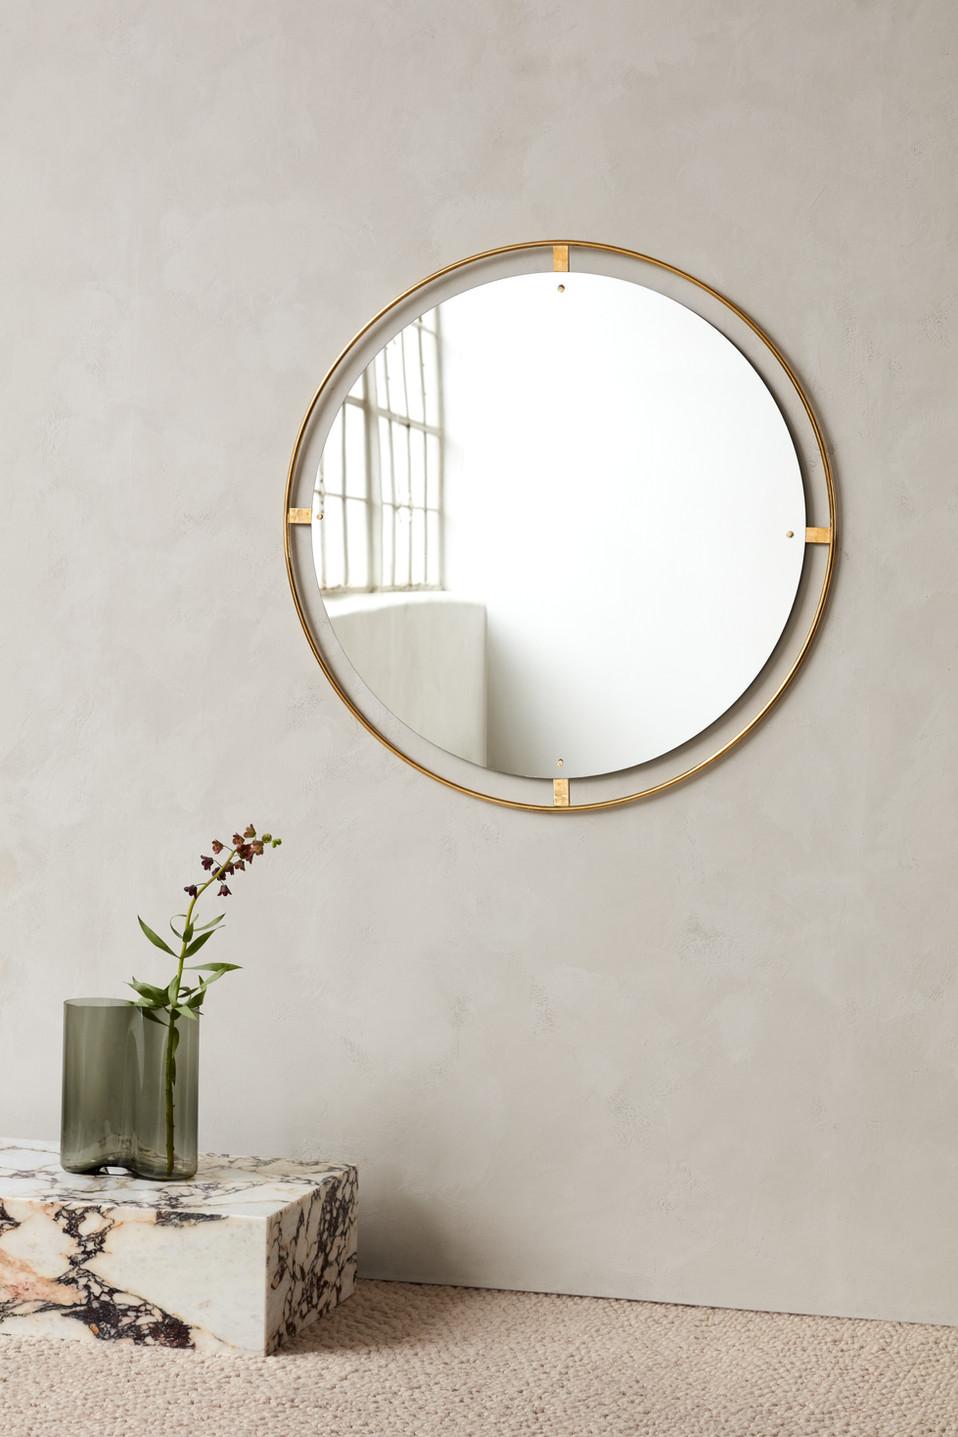 MENU_Nimbus_Mirror_Plinth_Aer_Vase.jpg